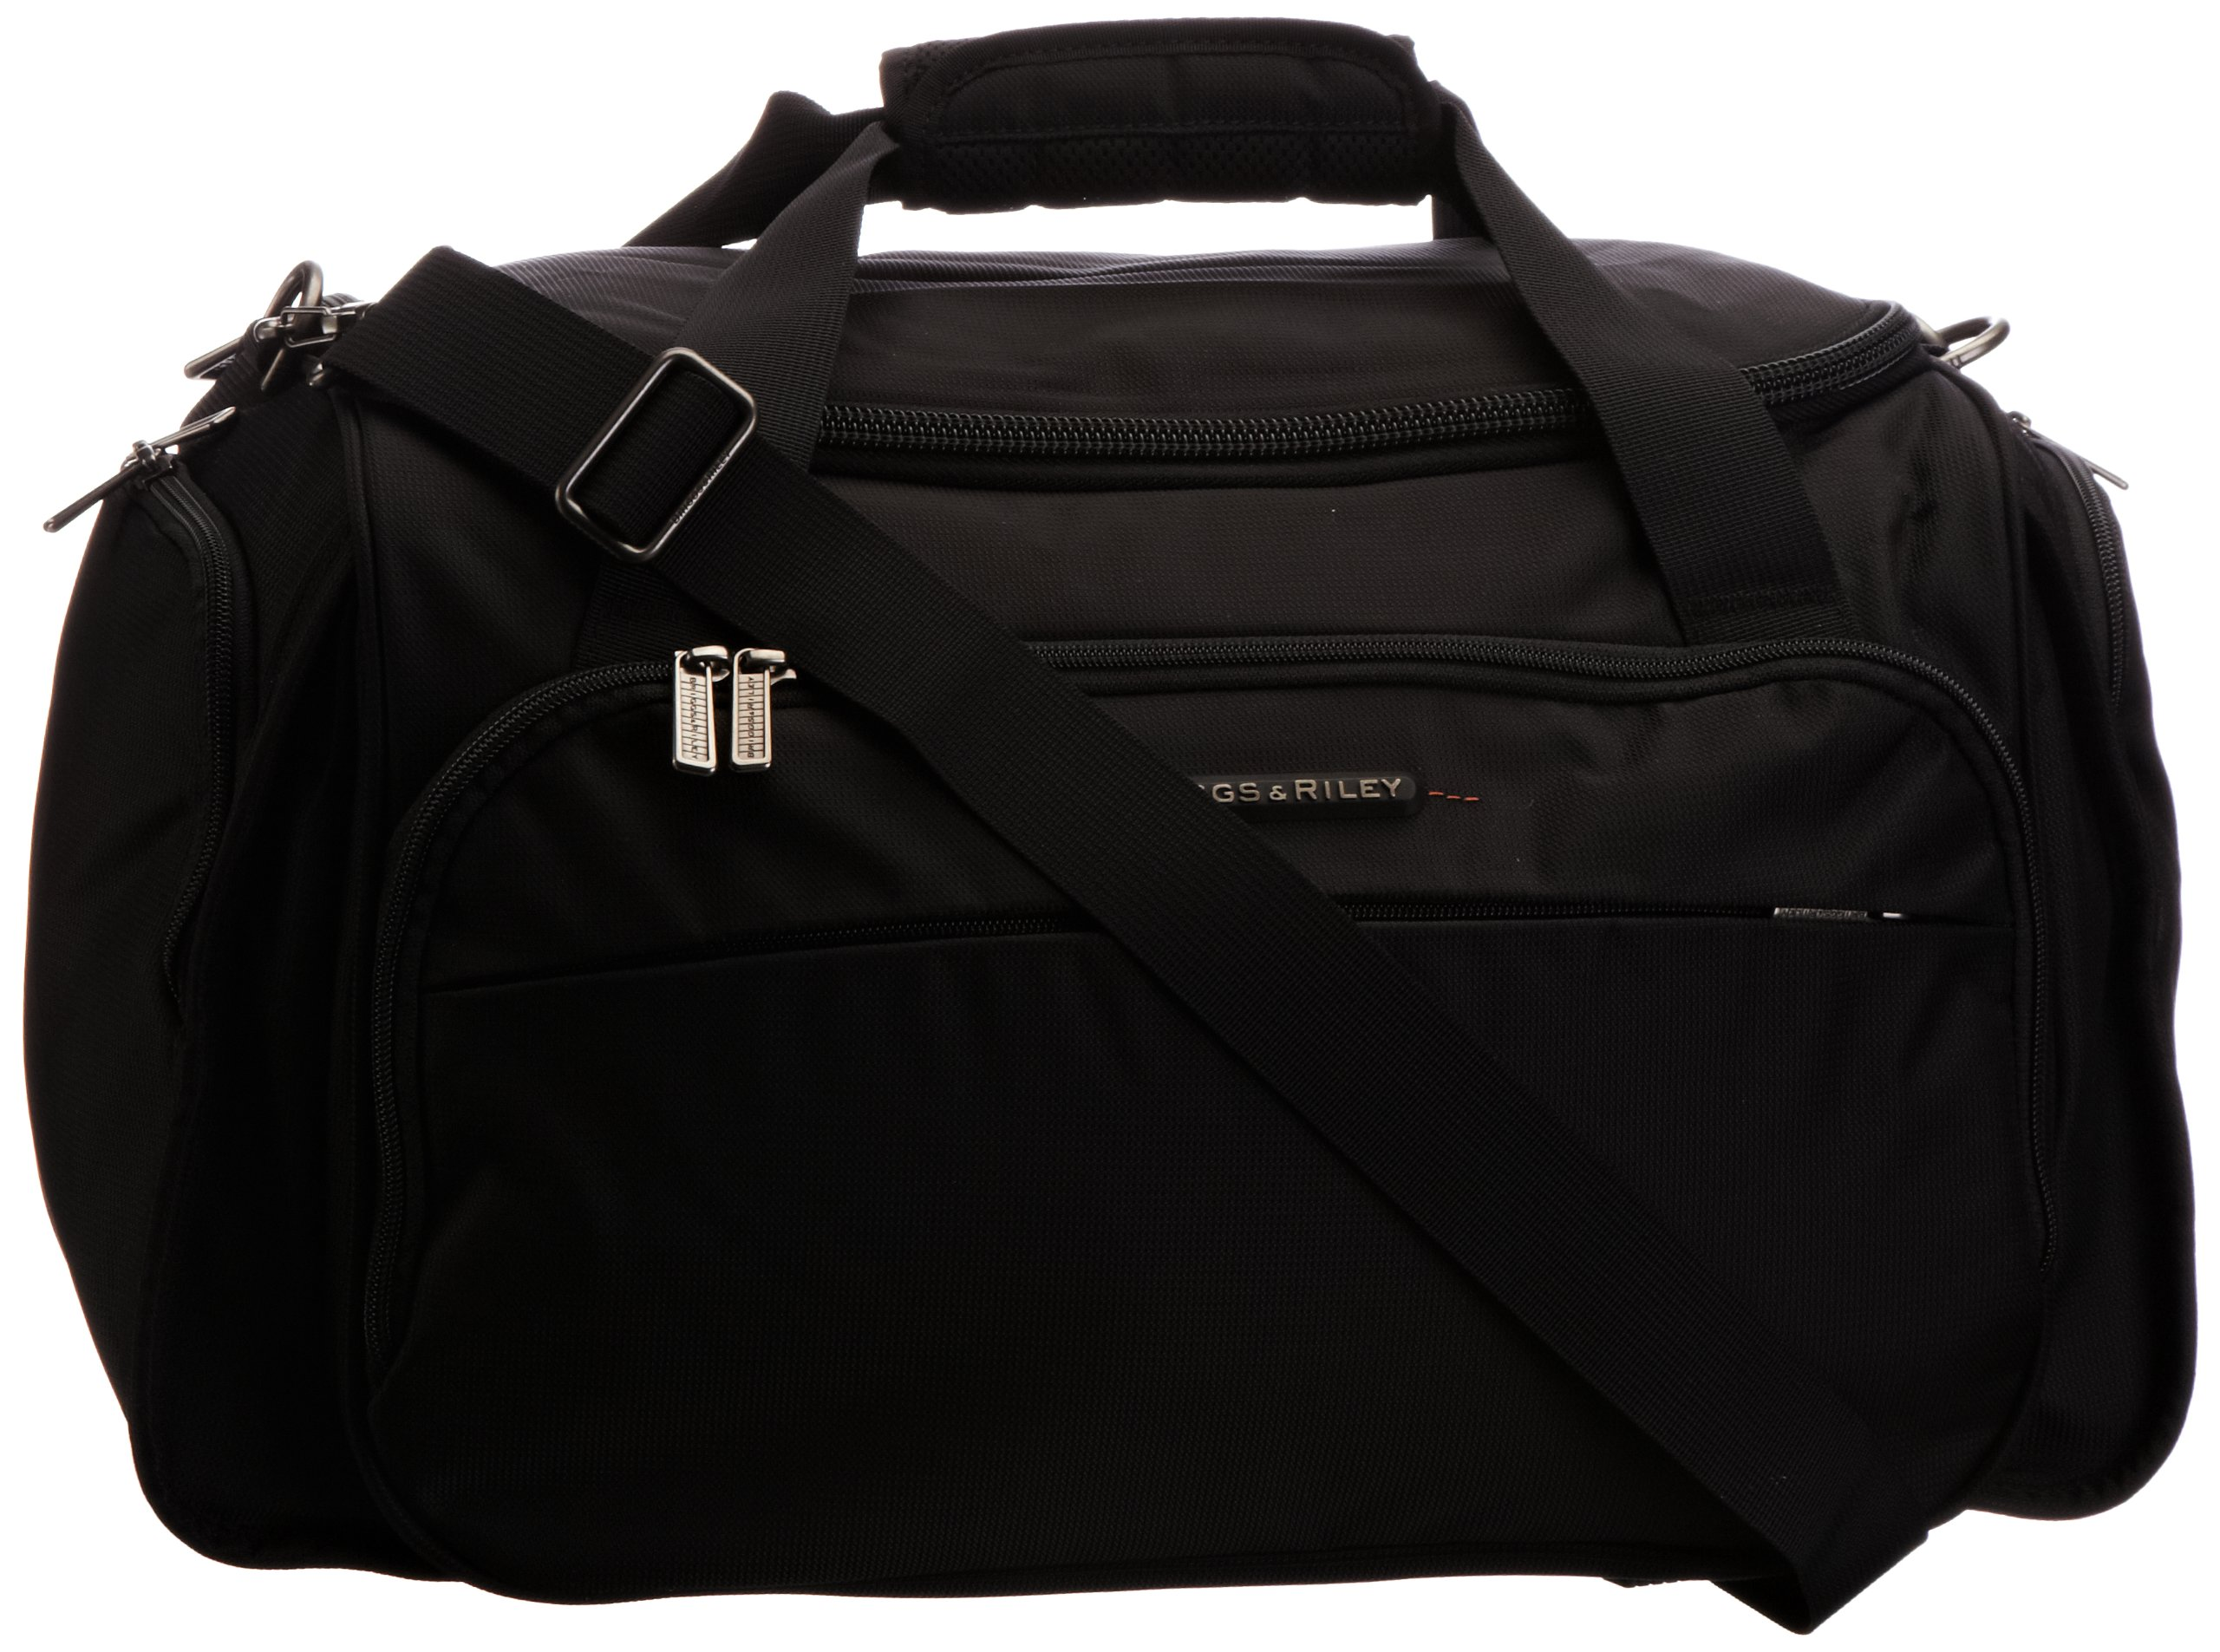 Briggs & Riley @ Transcend Luggage Cabin Duffle Bag, Black, 10.5